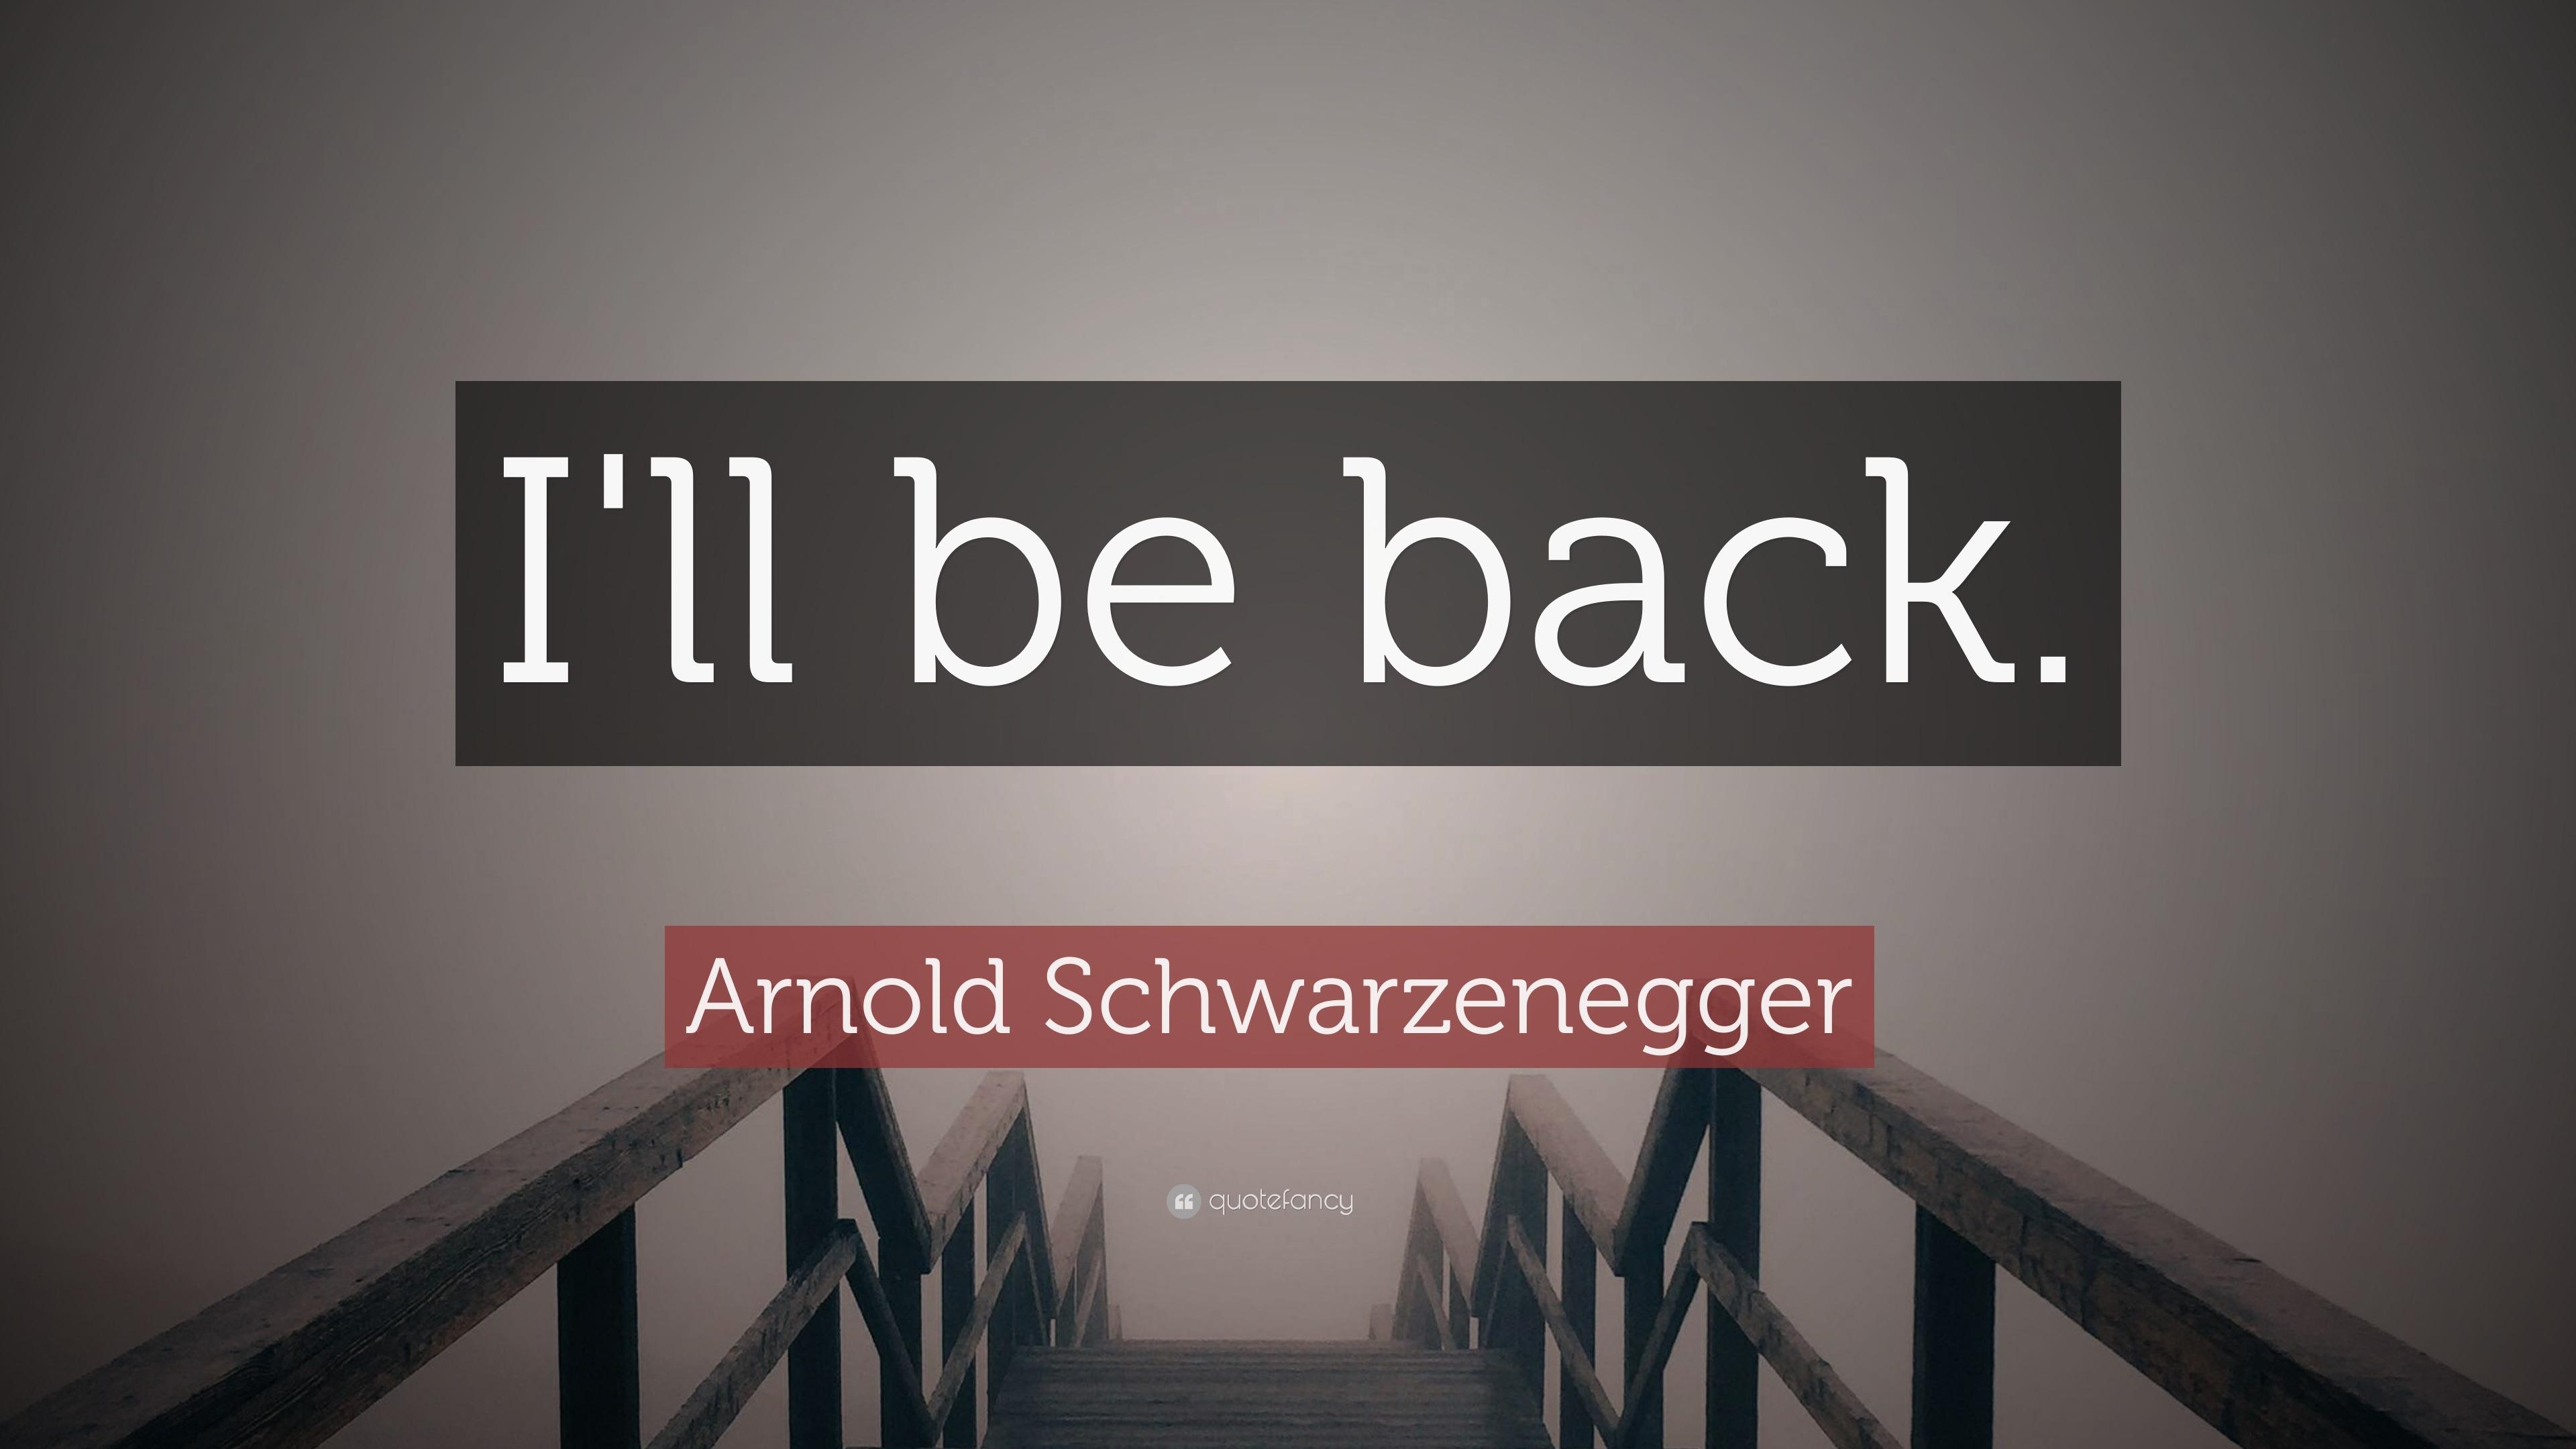 Arnold Schwarzenegger Quote: Ill be back. (19